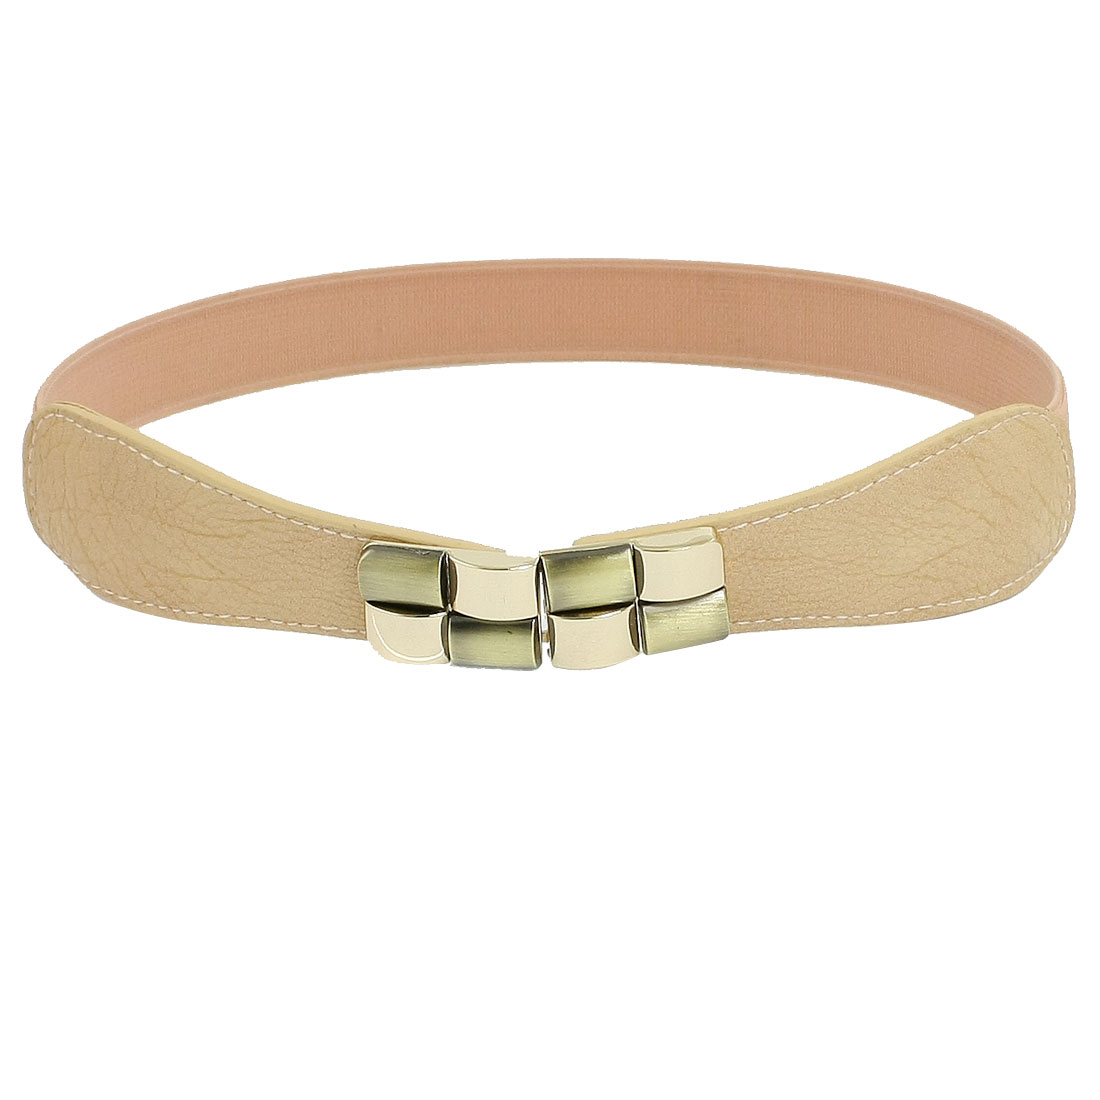 Pink Elastic Cinch Metal Interlocking Buckle Waist Belt for Women